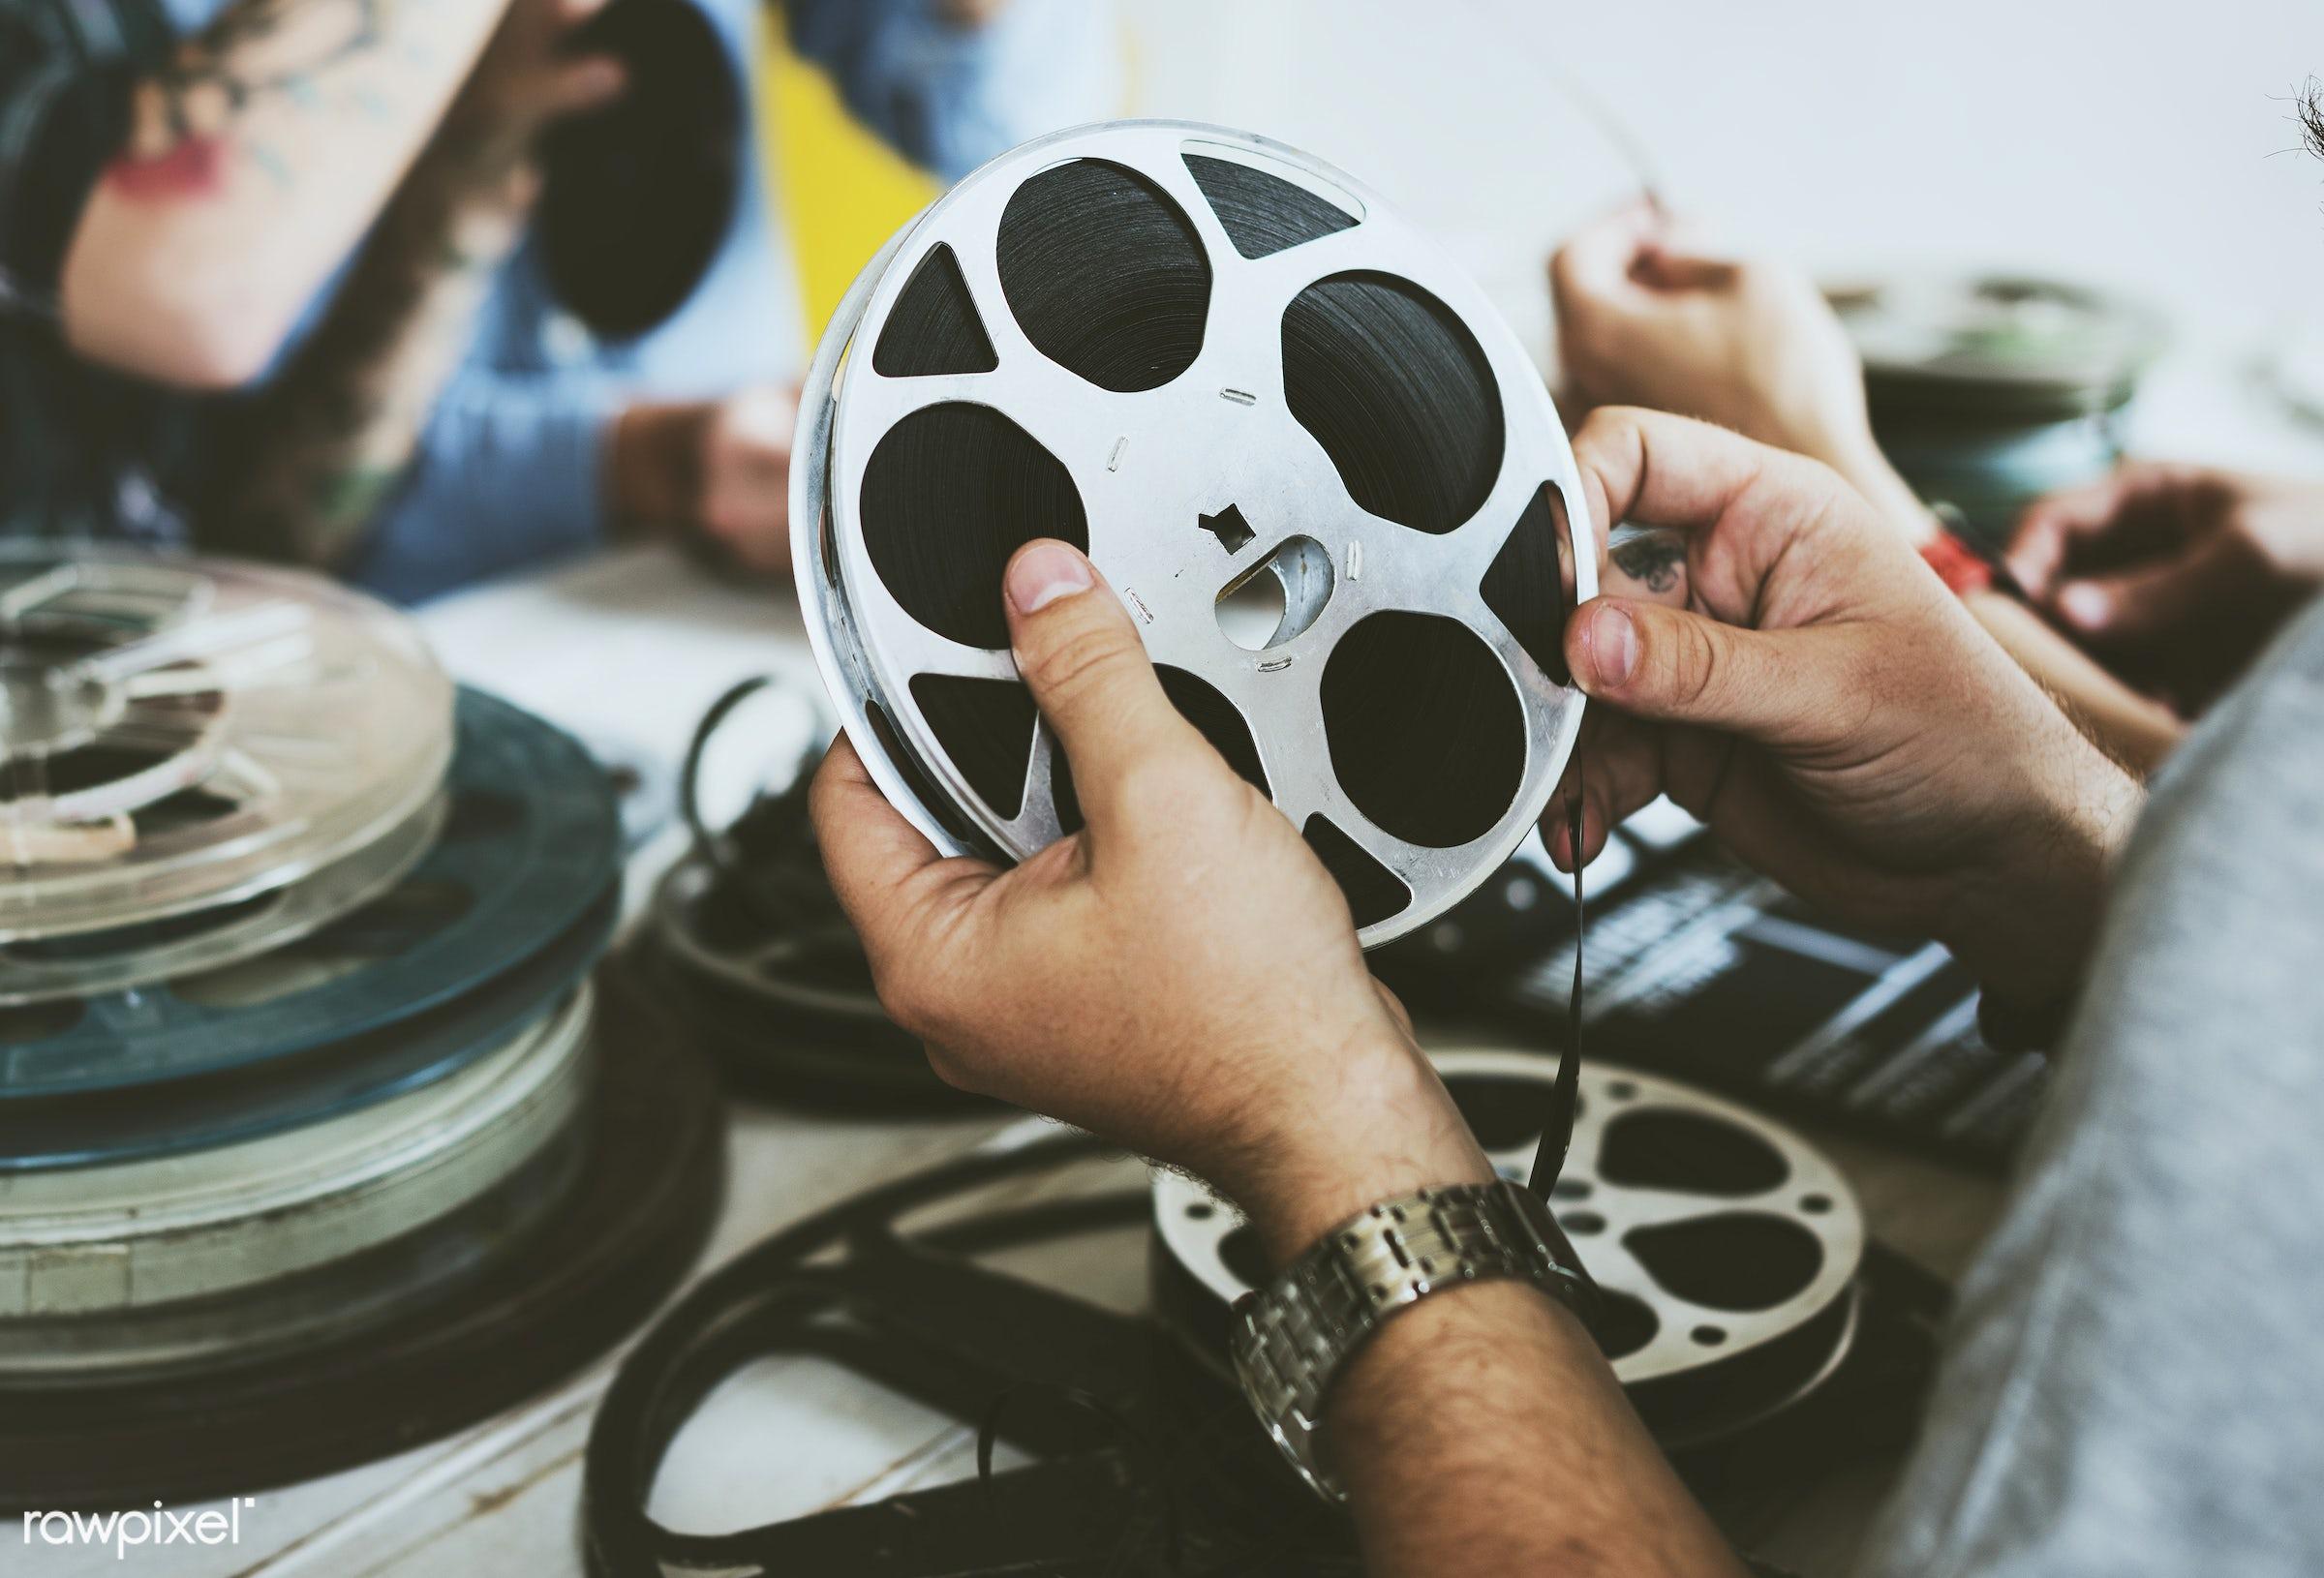 Hand hold a film strip - action, analog, antique, cinema, entertainment, equipment, film, film strip, hands, holding, movie...